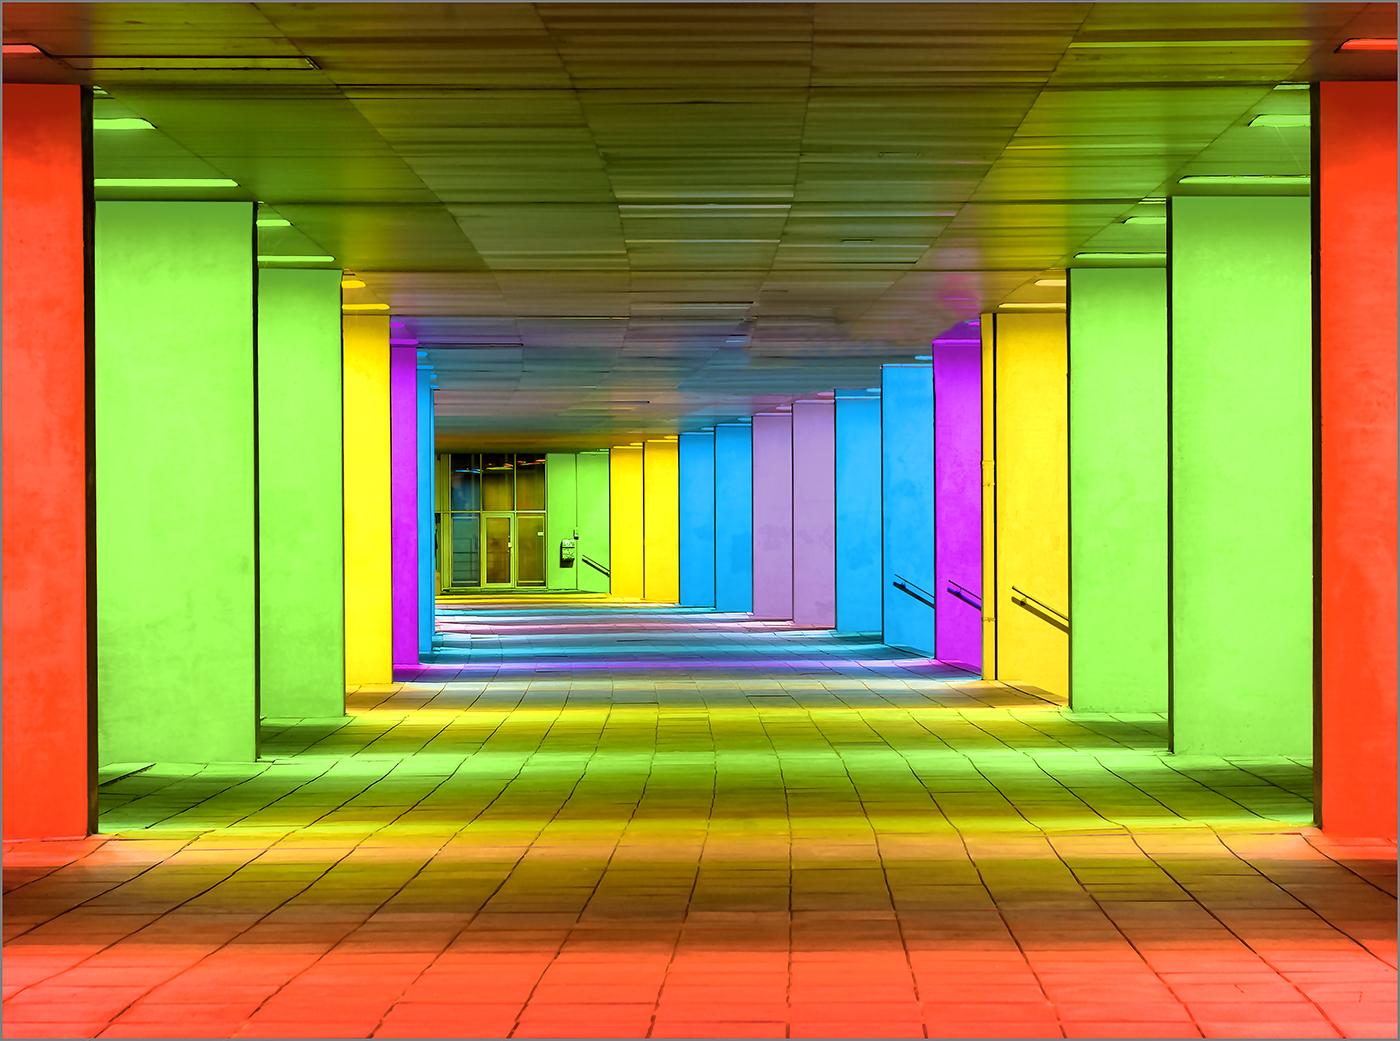 Illuminated Arcades, Netherlands